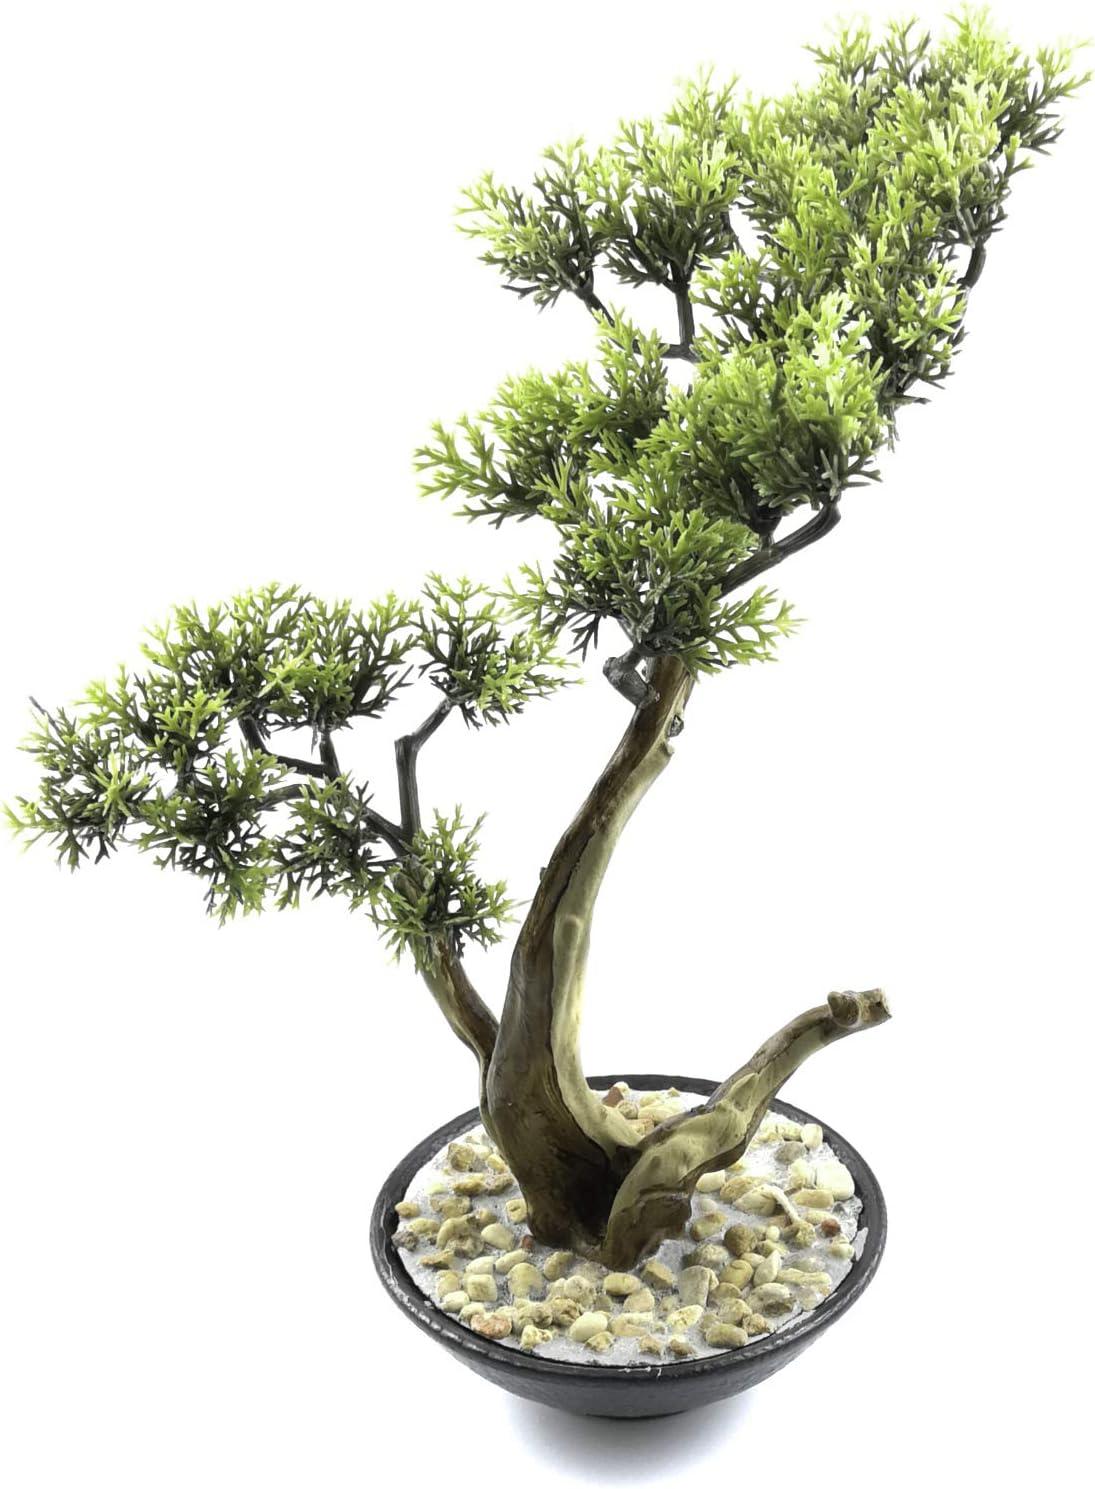 Tuokor Artificial Bonsai Tree 10.5 Inch Tall Small Docorative Cypress Faux Plants in Ceramic Pot